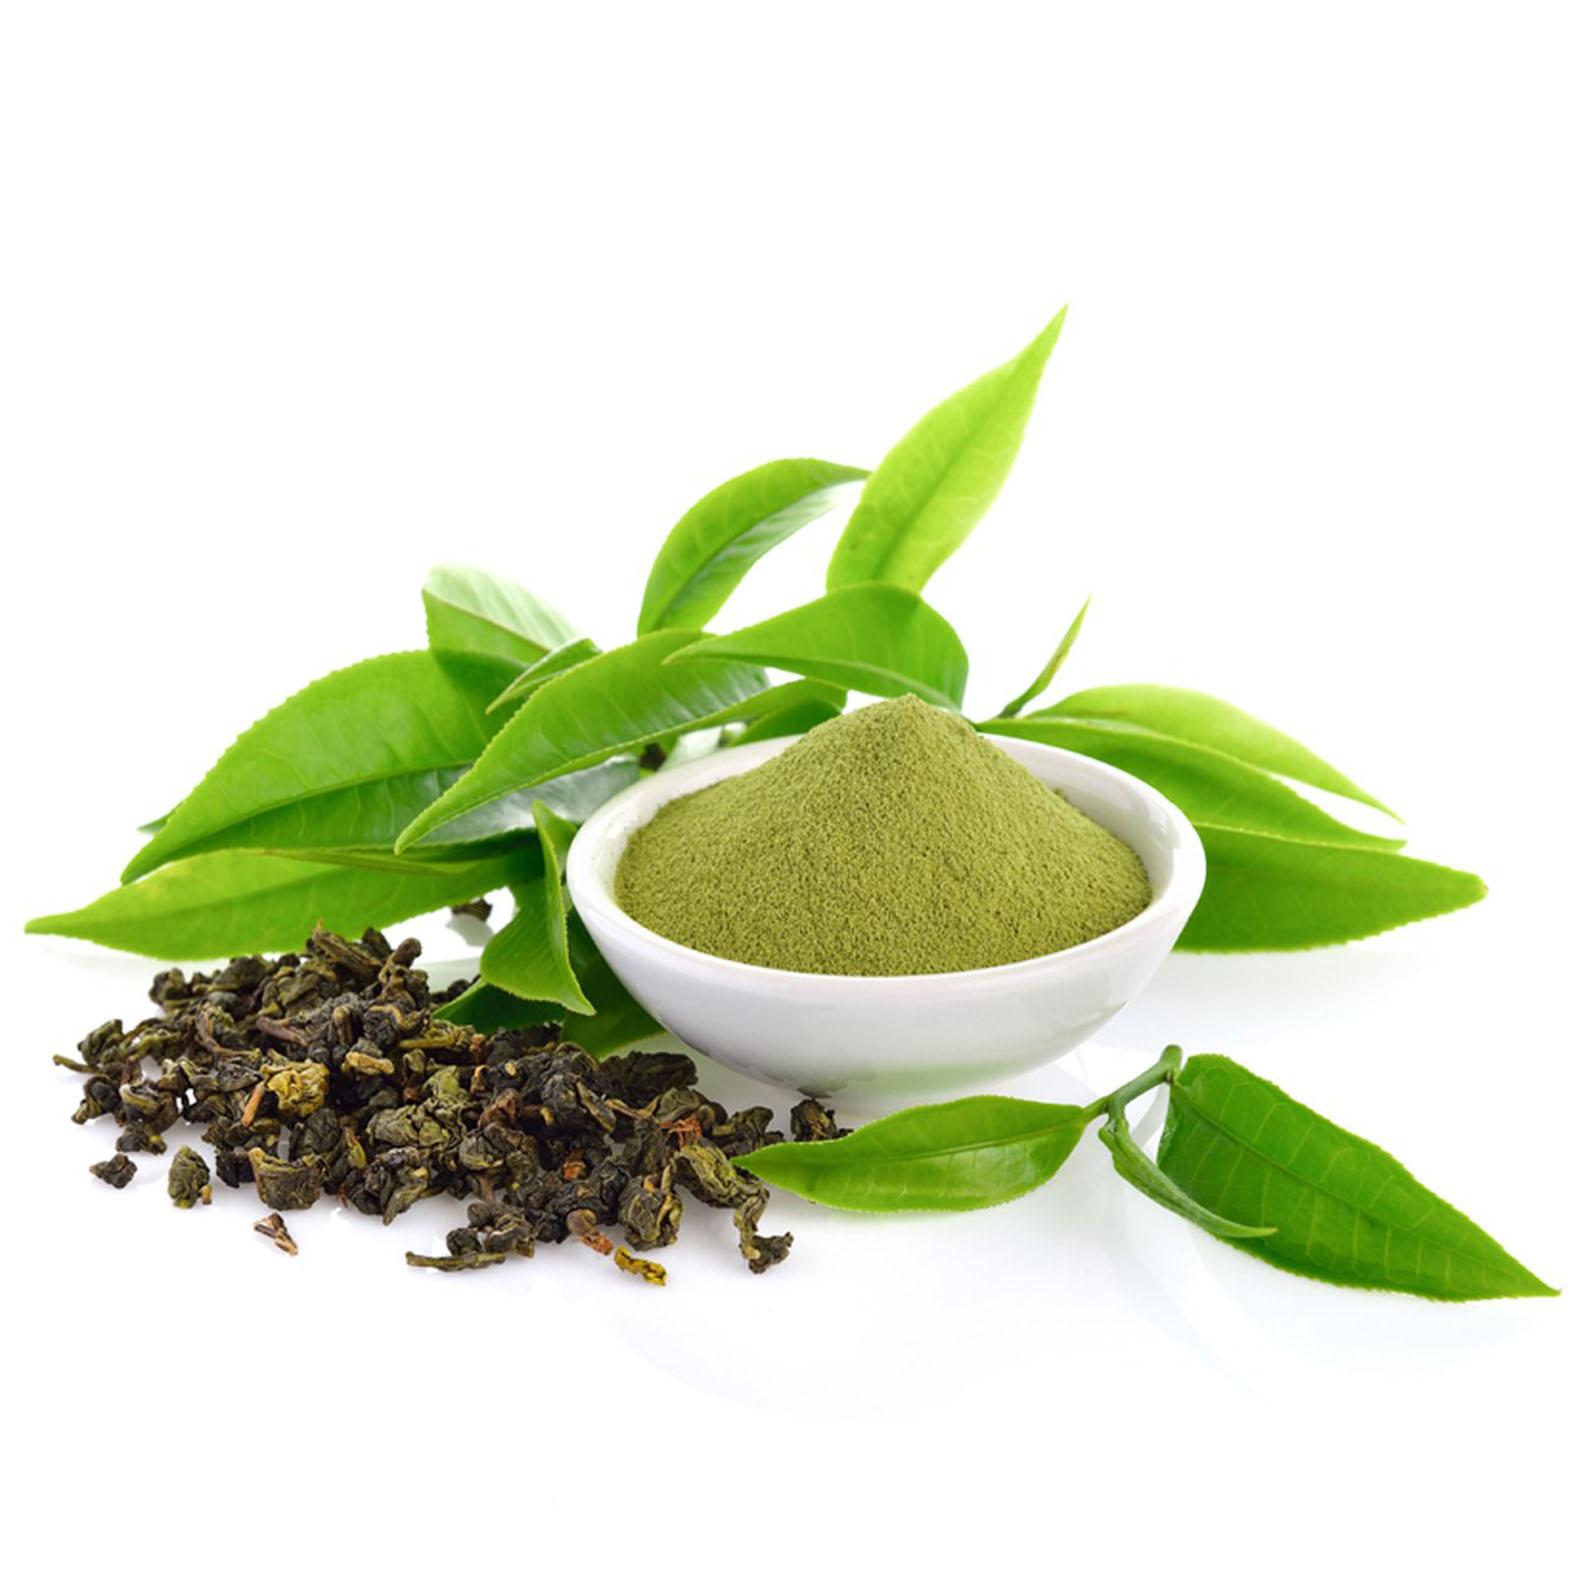 mocu-organic-matcha-green-tea-detail-1.jpg